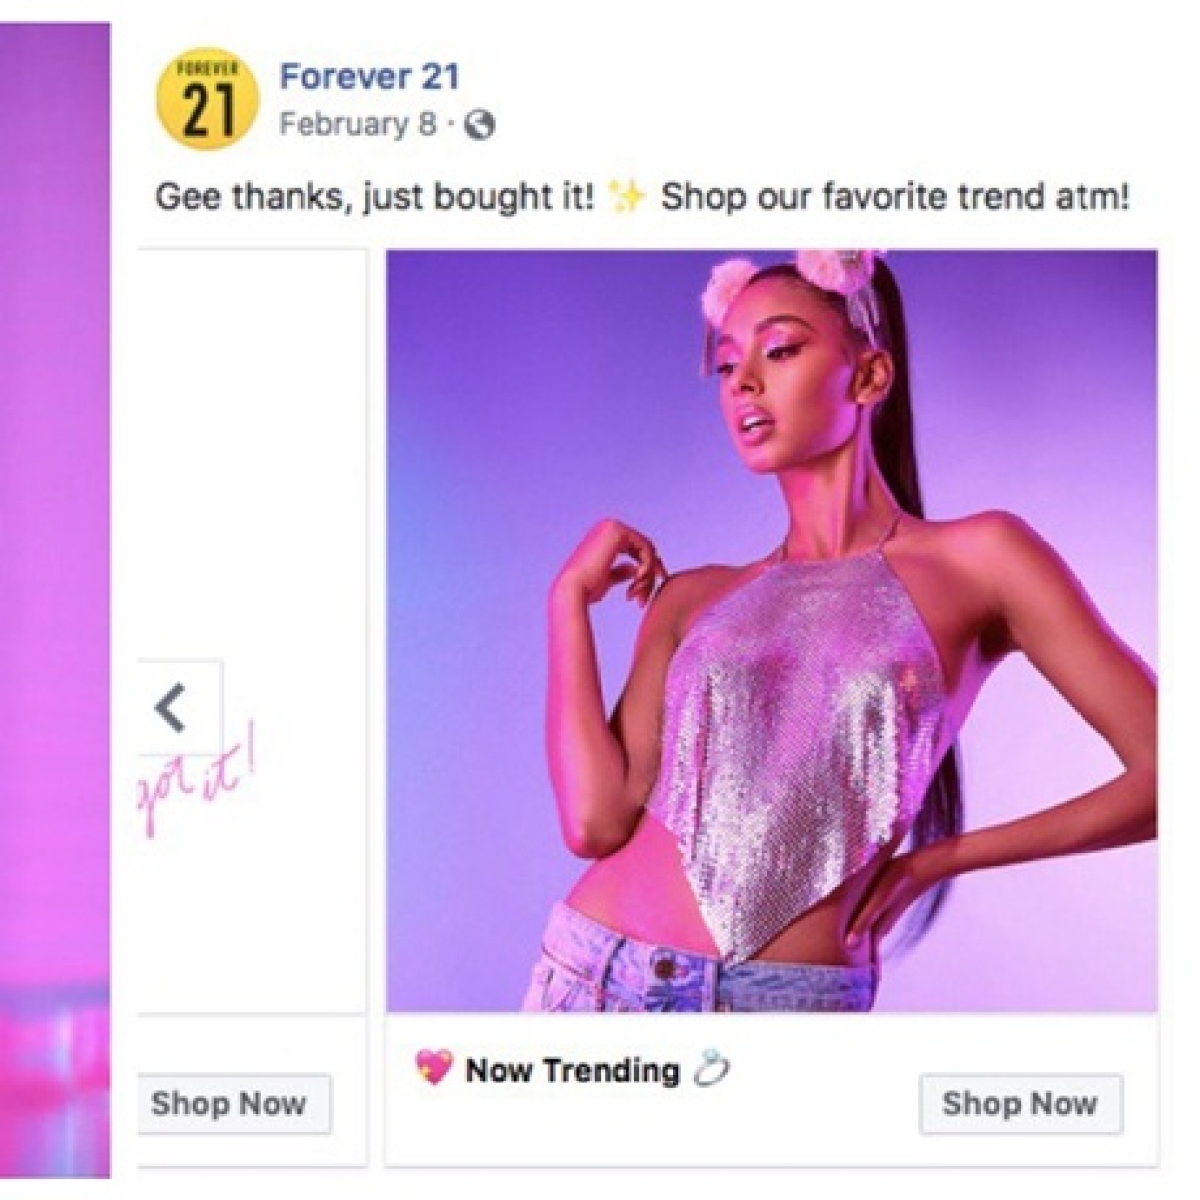 Ariana Grande sues 'Forever 21' for using look-alike model